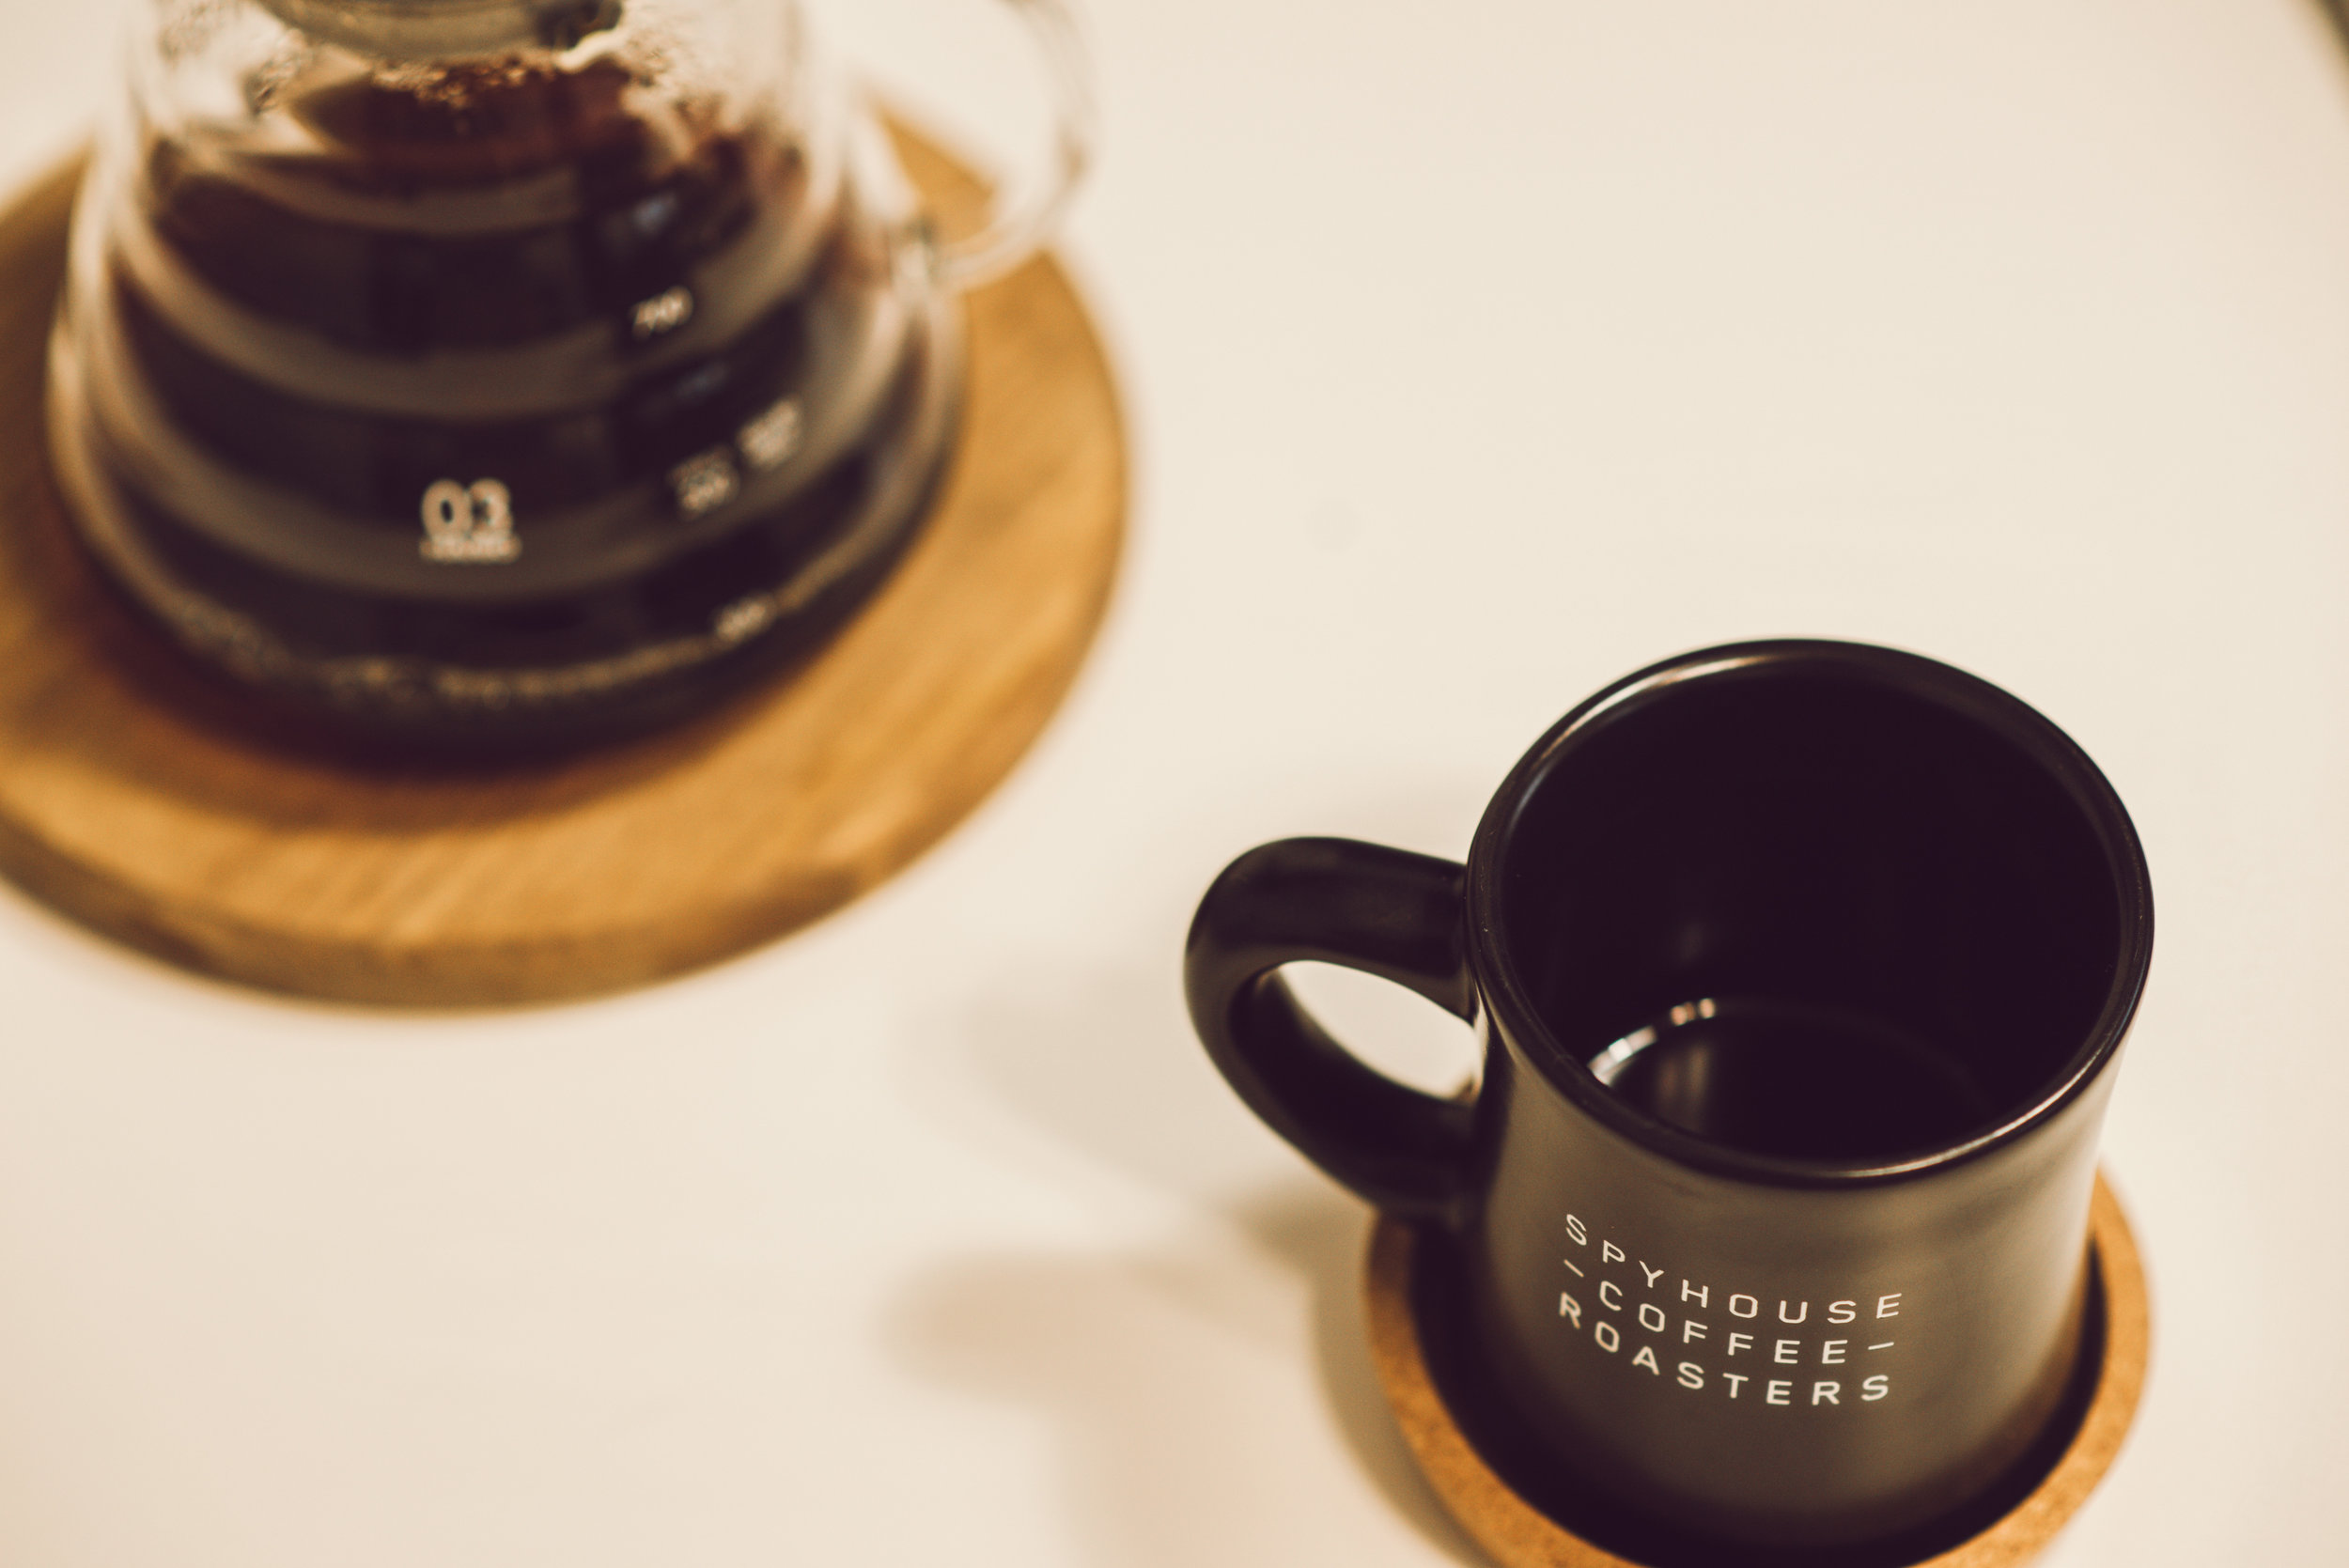 Homemade coffee in V60